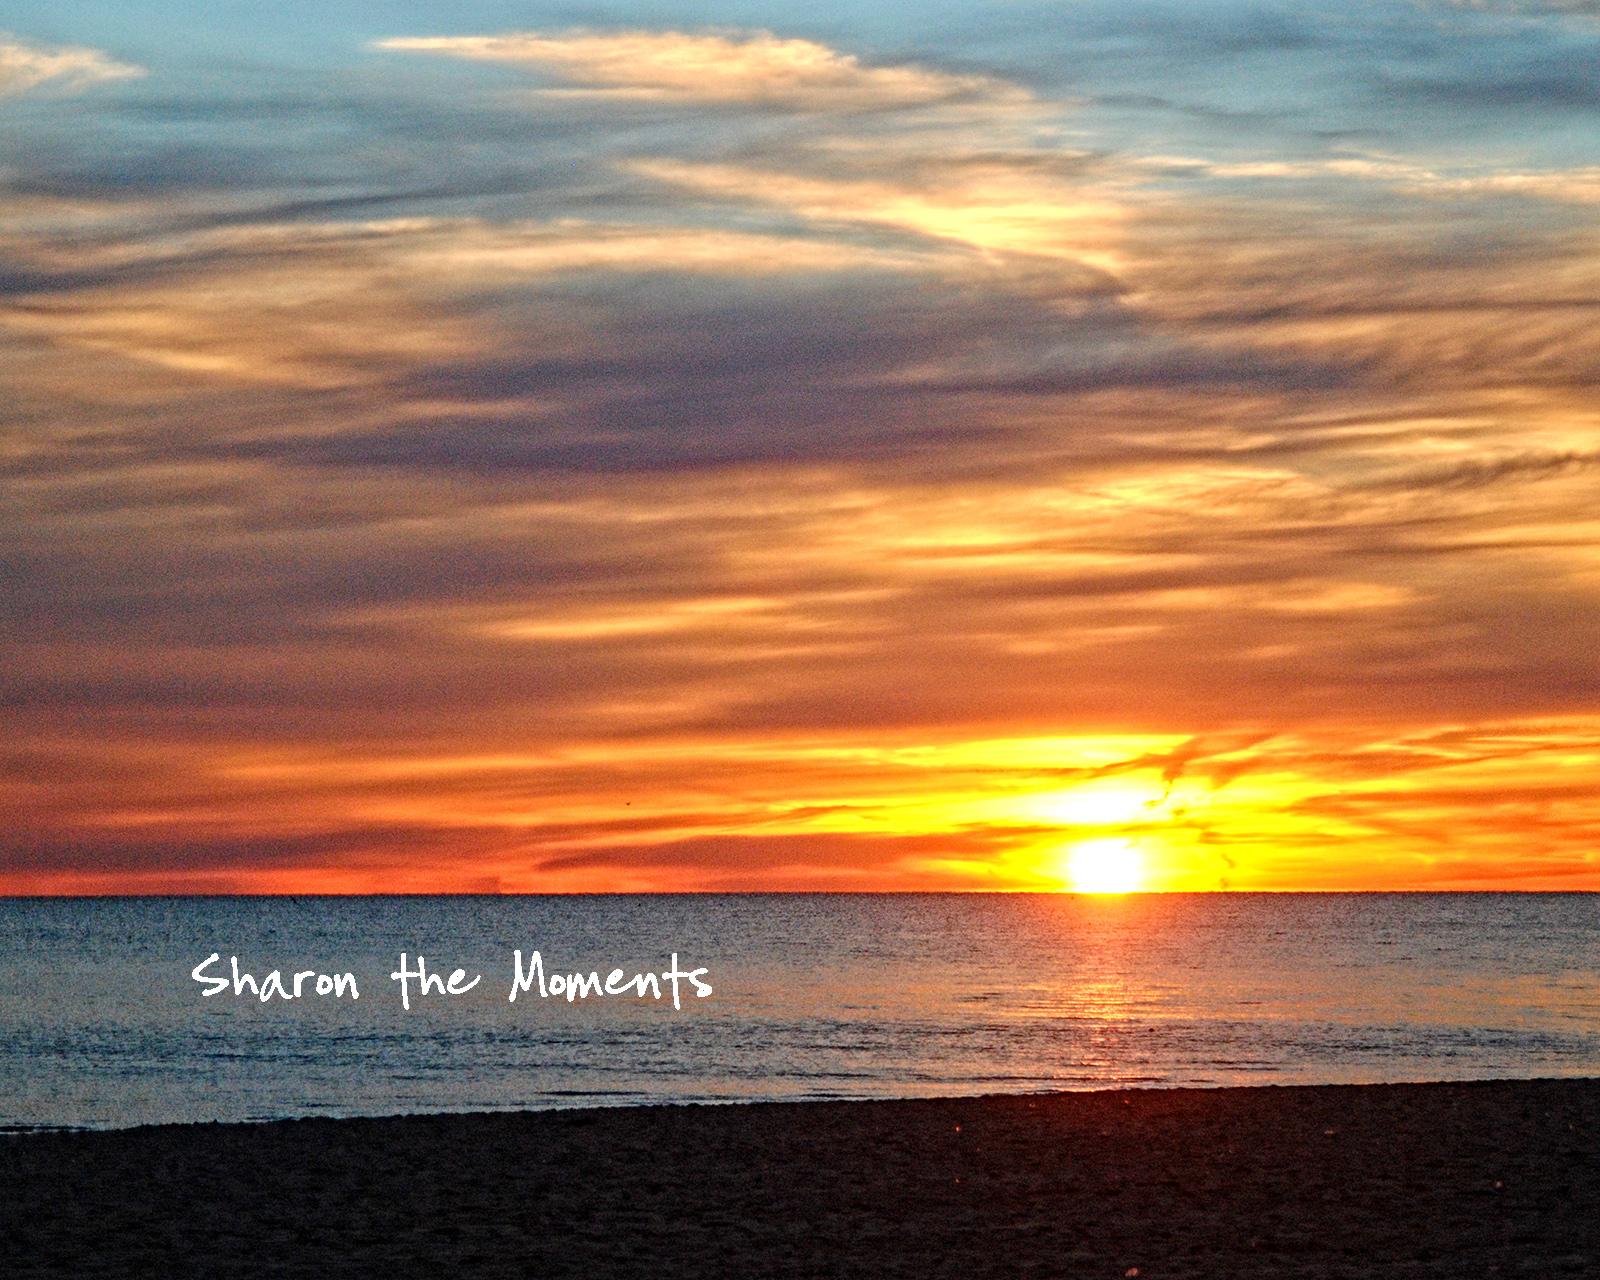 Lake Erie Shores & Islands Cedar Point Sandusky Ohio Sunrise|Sharon the Moments blog